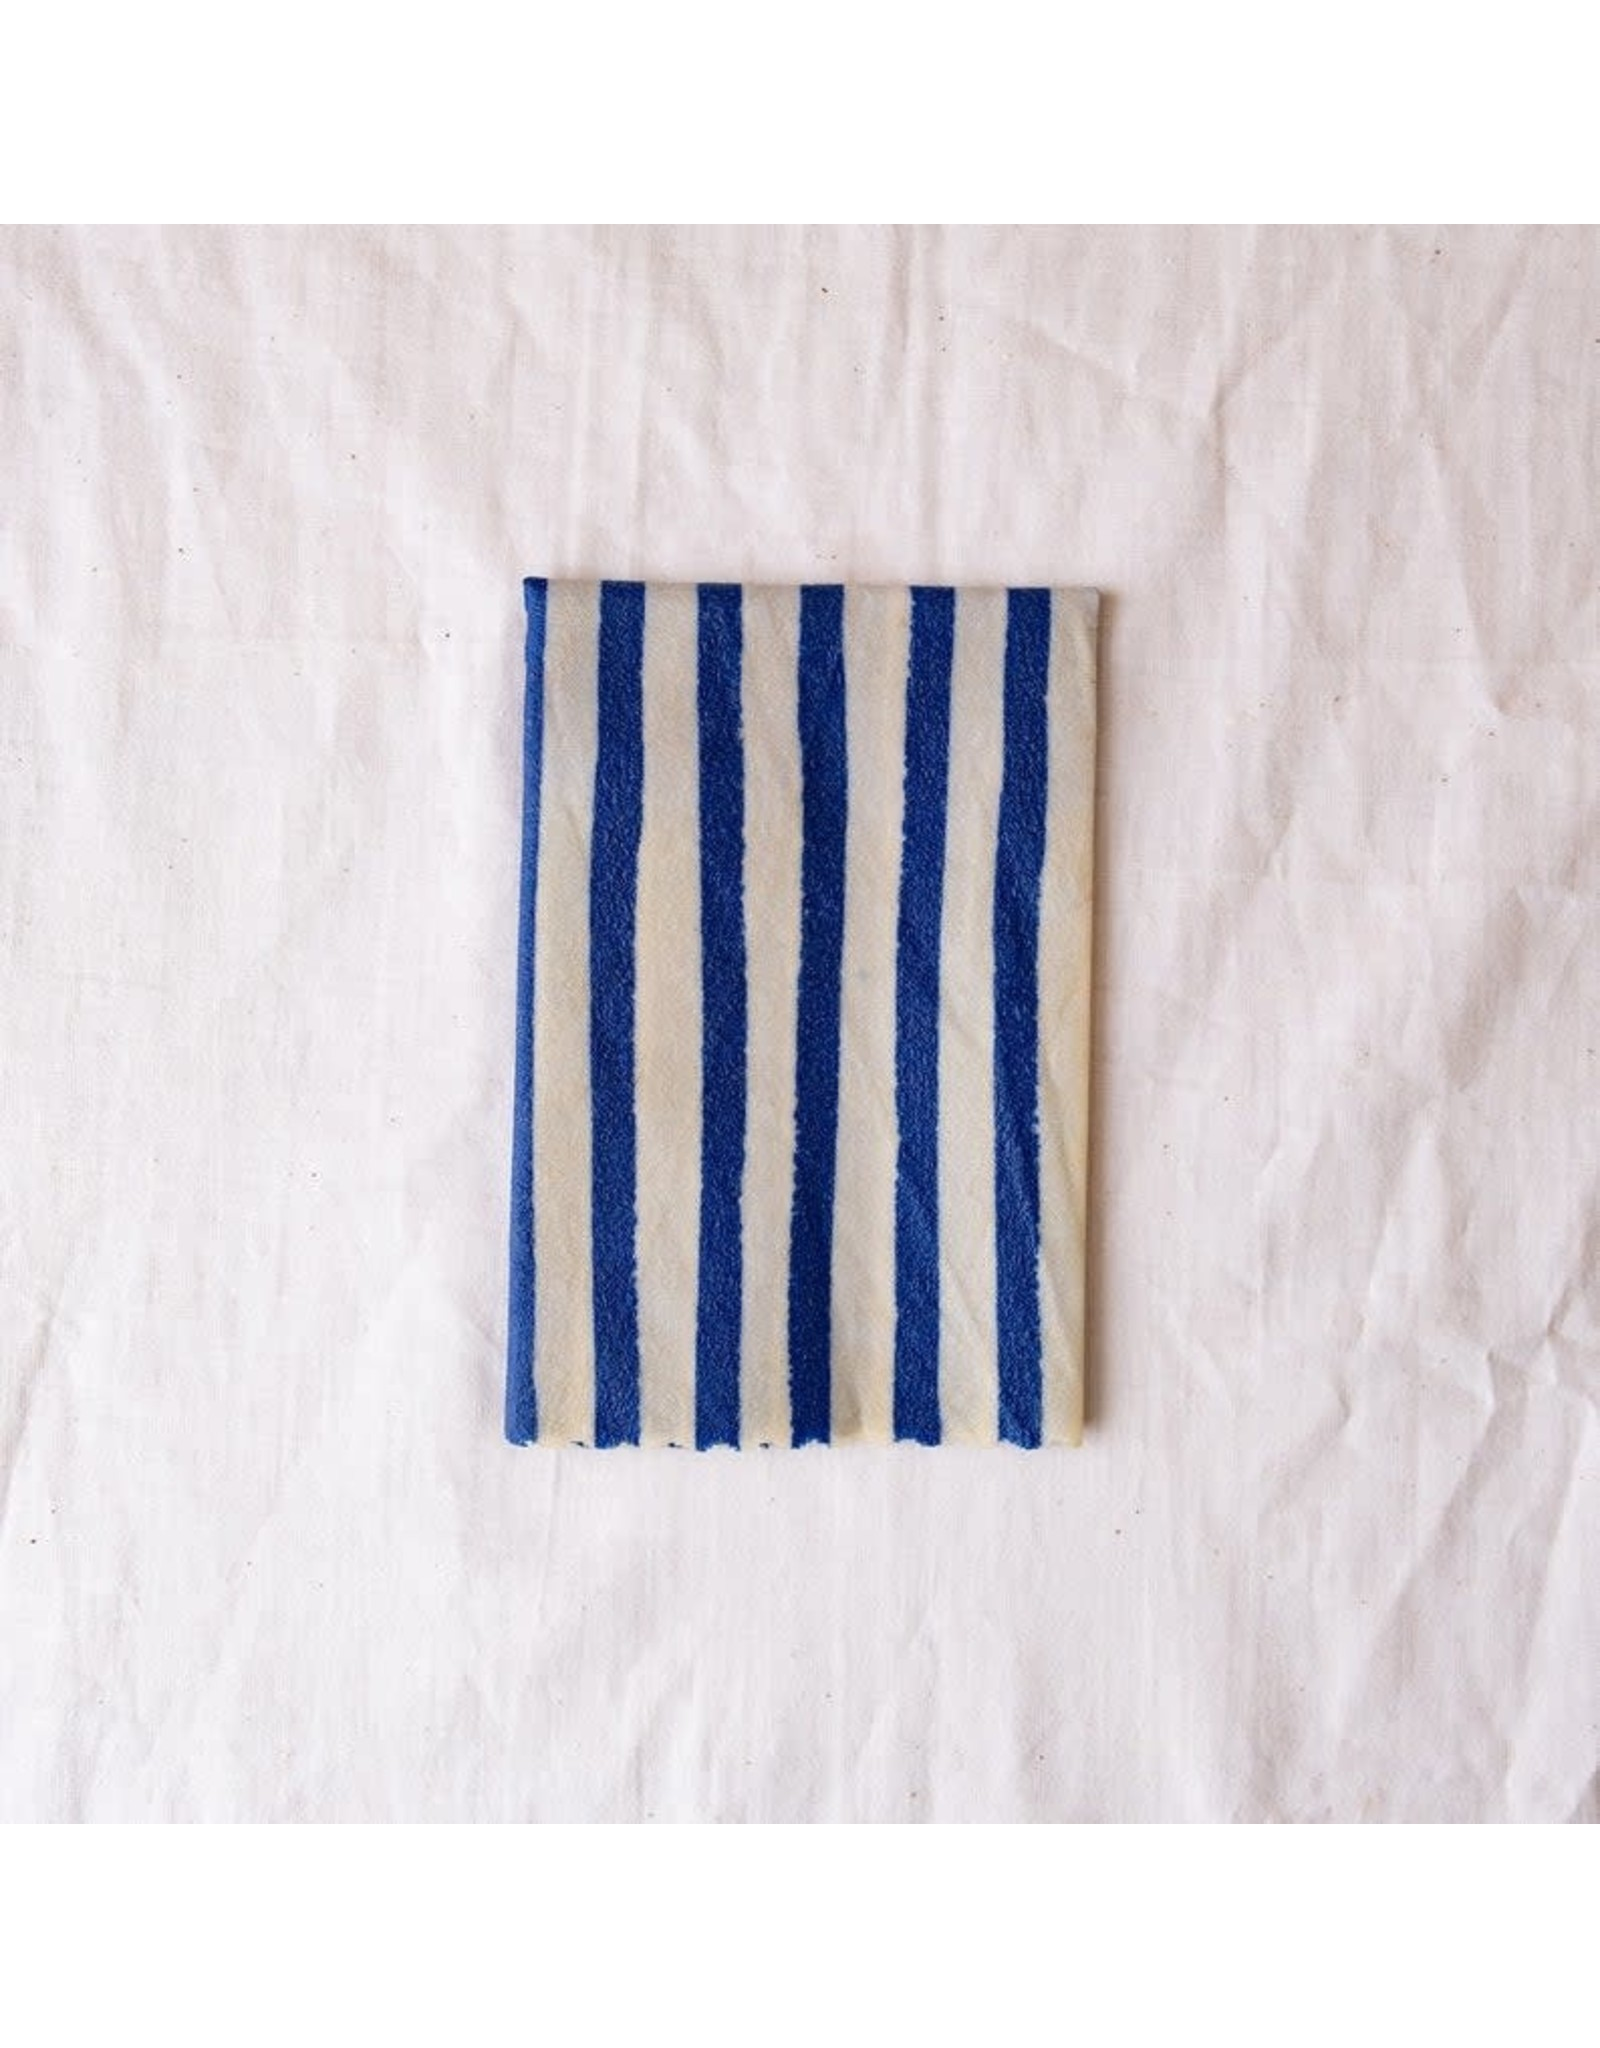 Mooshki Made Single X- Large 'Nautical Blue'  Beeswax Wrap